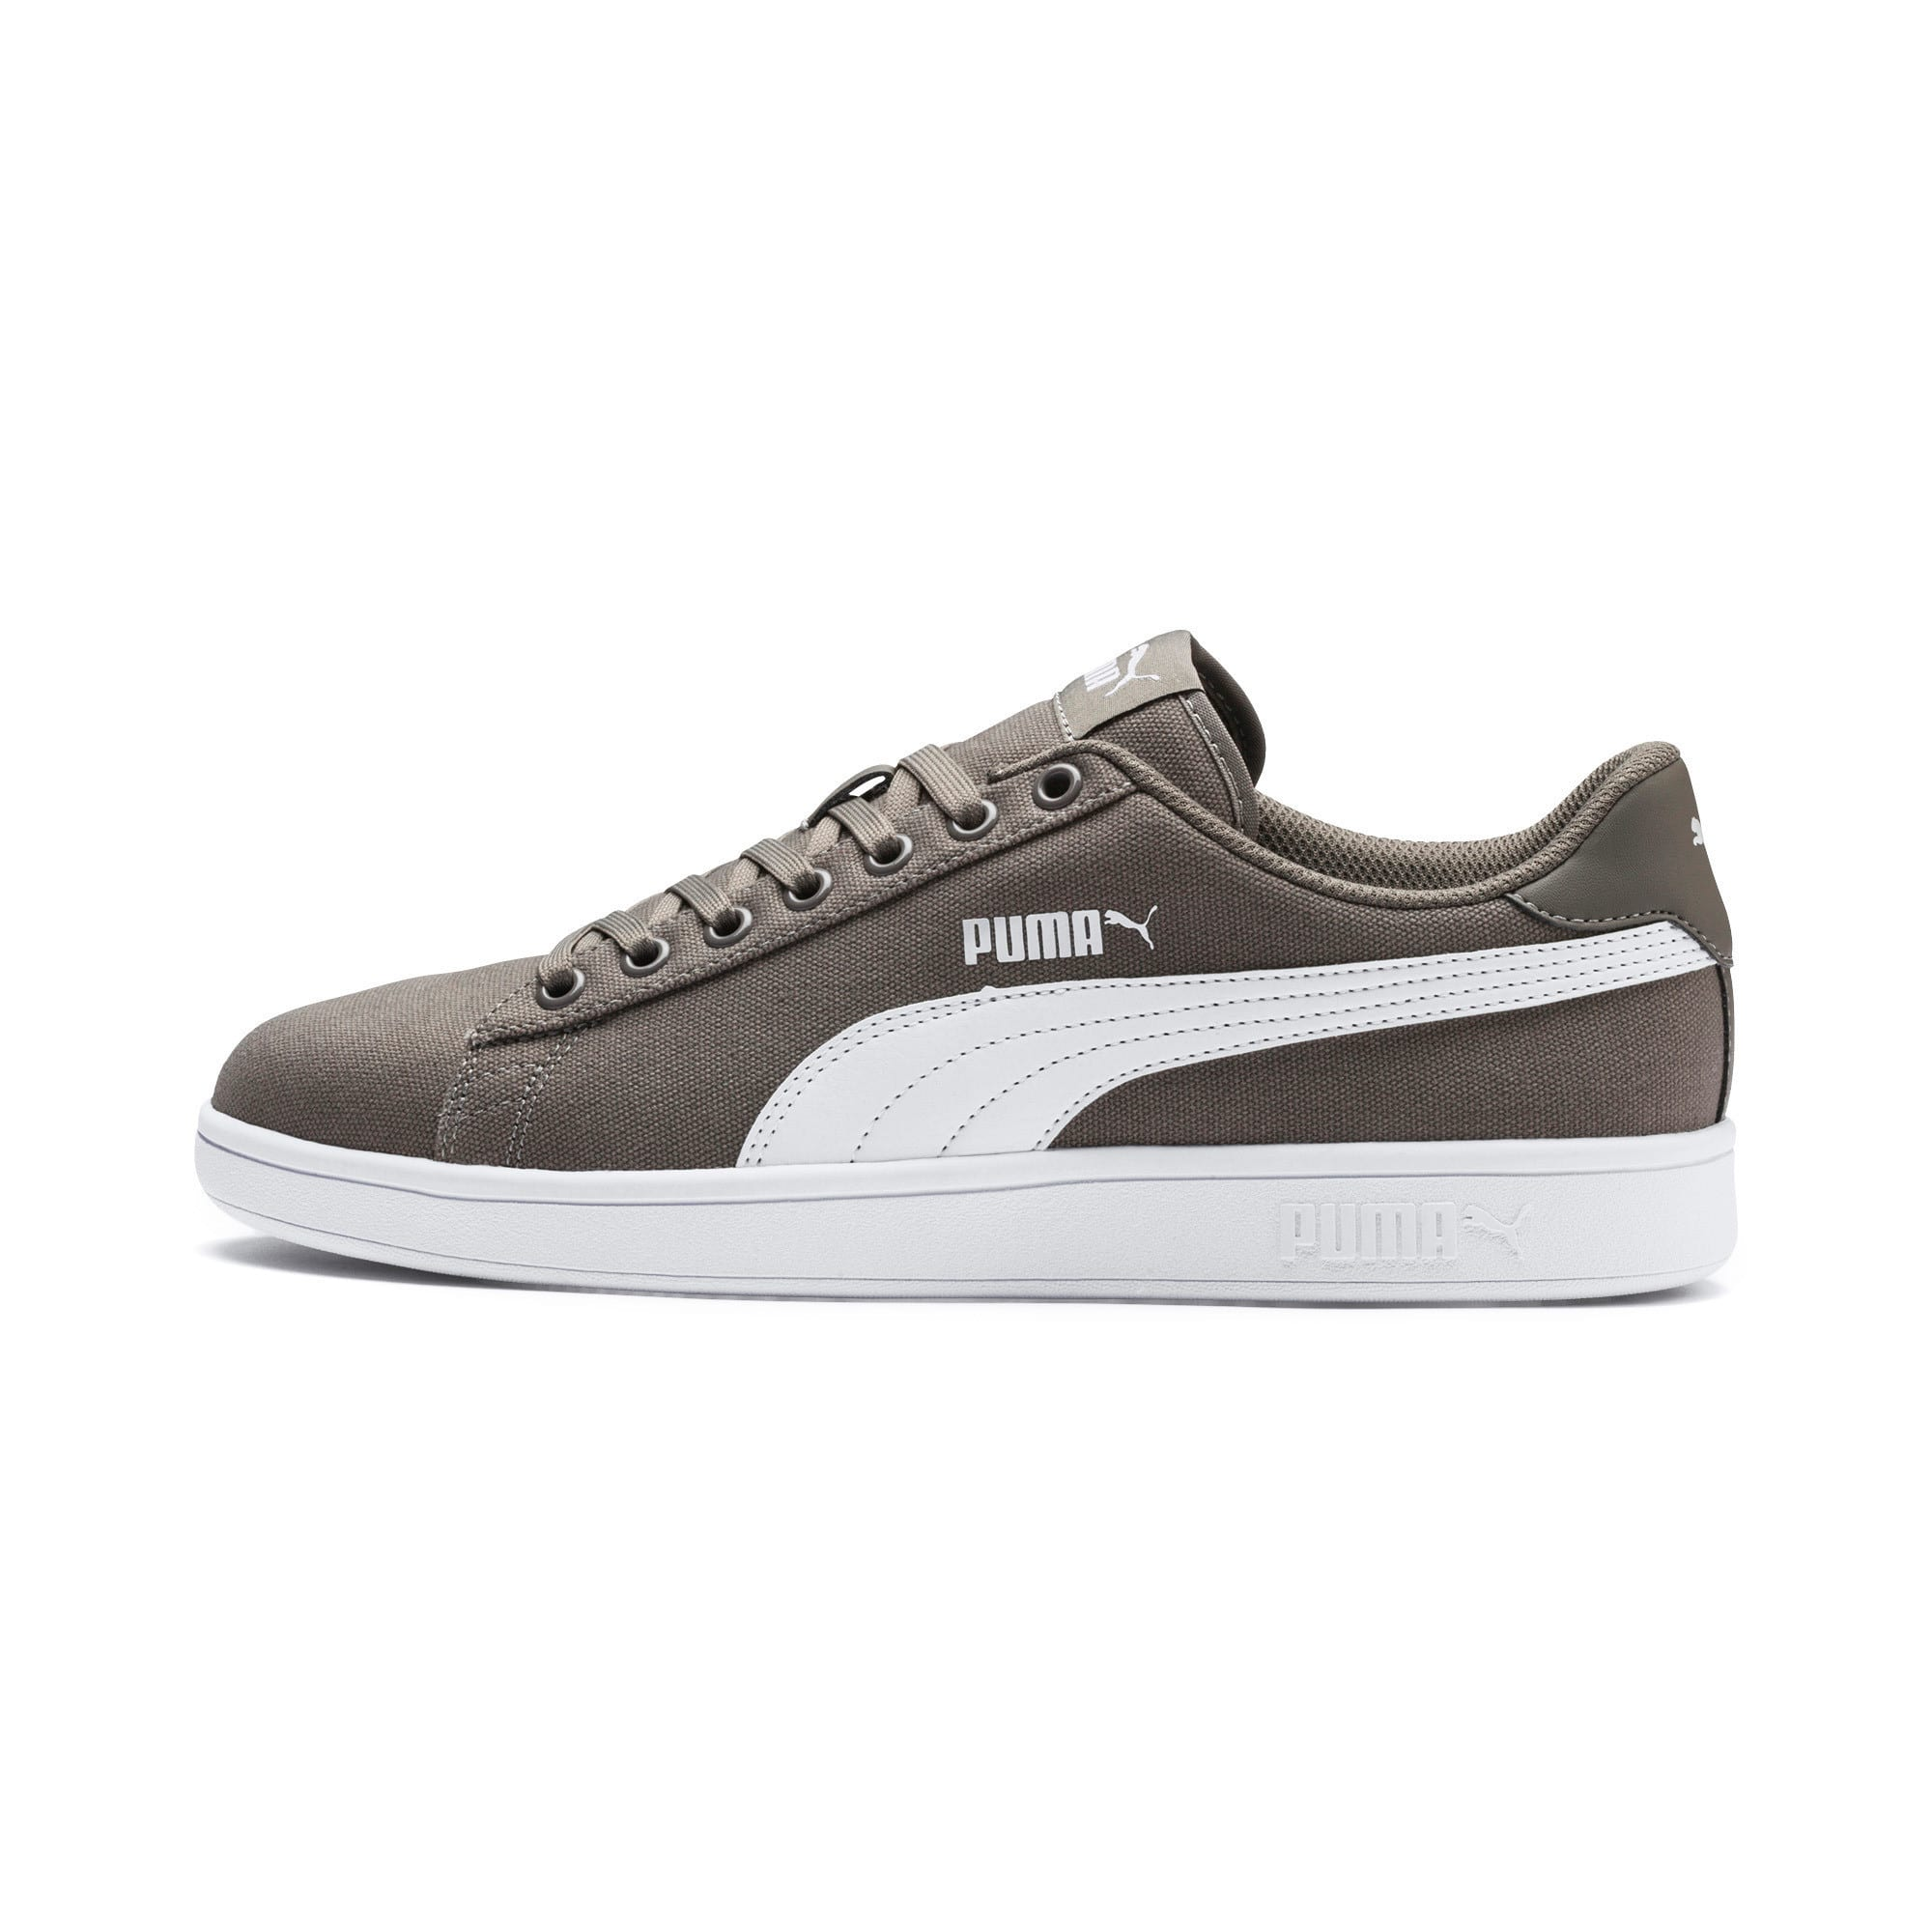 Thumbnail 1 of PUMA Smash v2 Sneakers, Charcoal Gray-Puma White, medium-IND